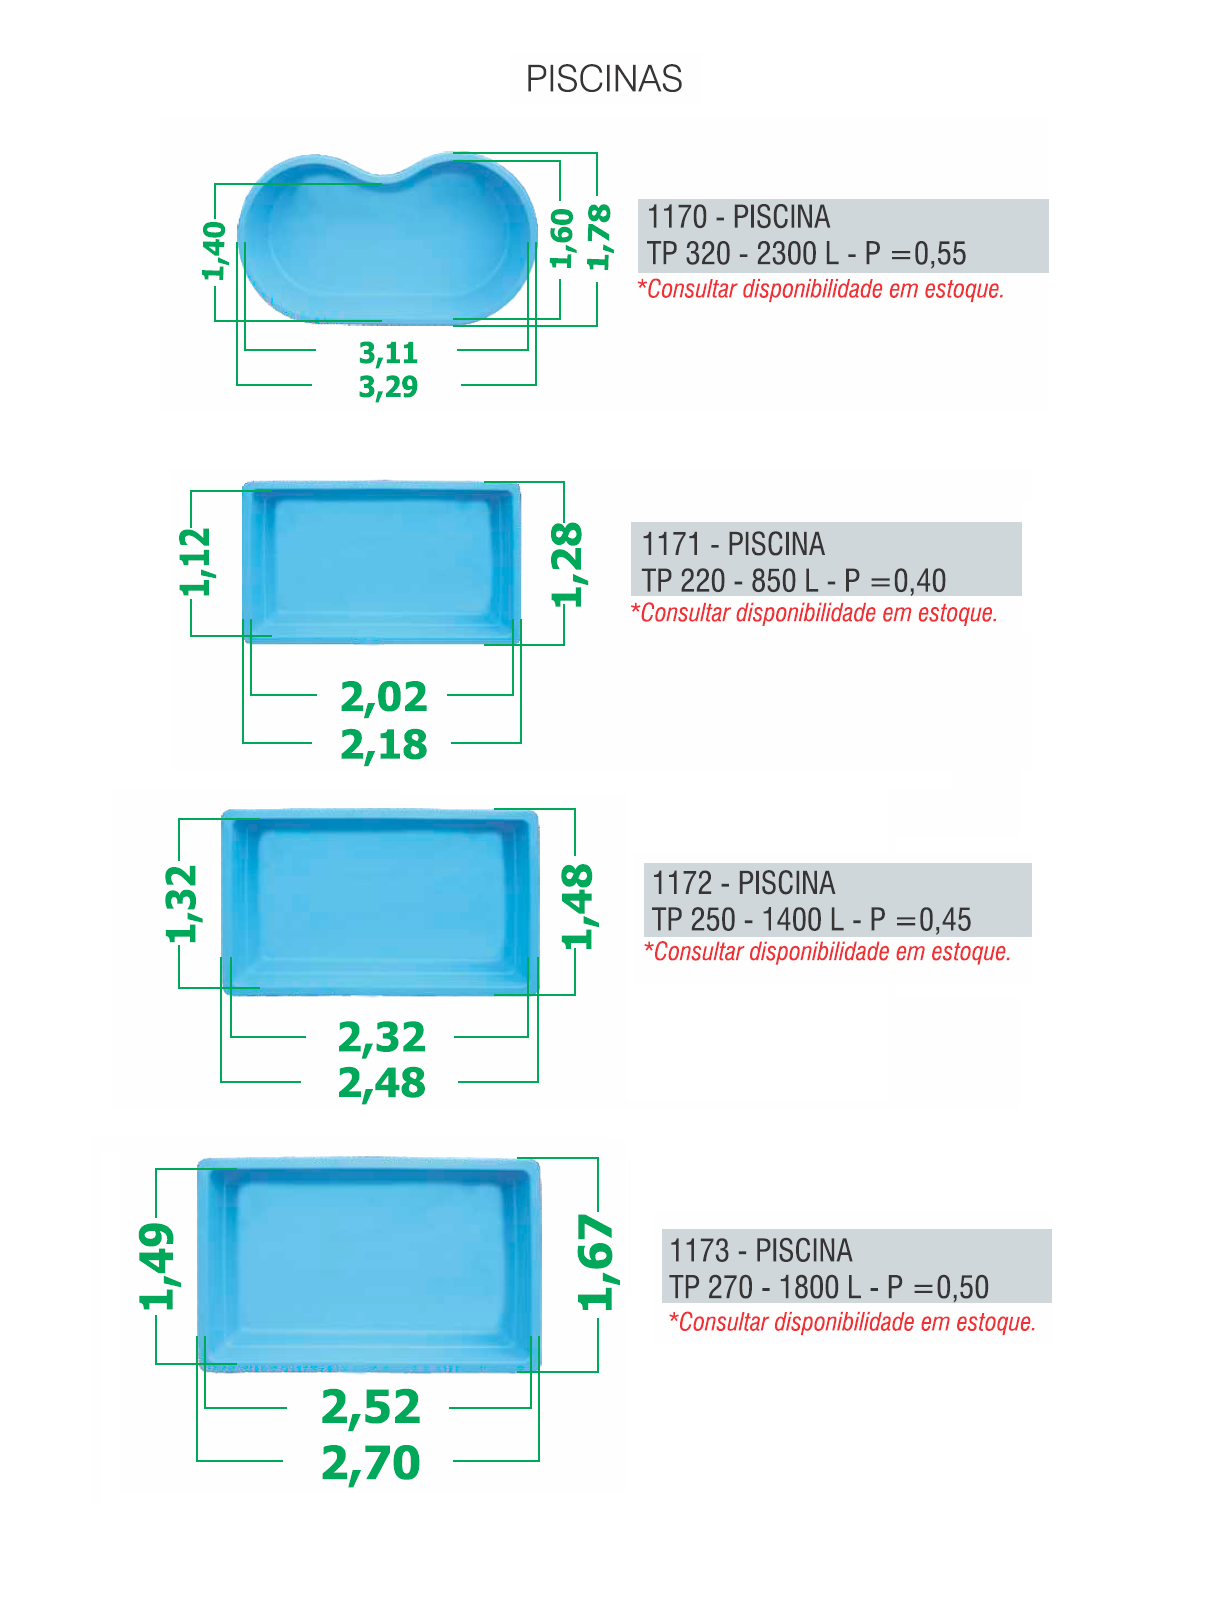 Piscinas pequenas modelos e estilos for Piscinas pequenas medidas